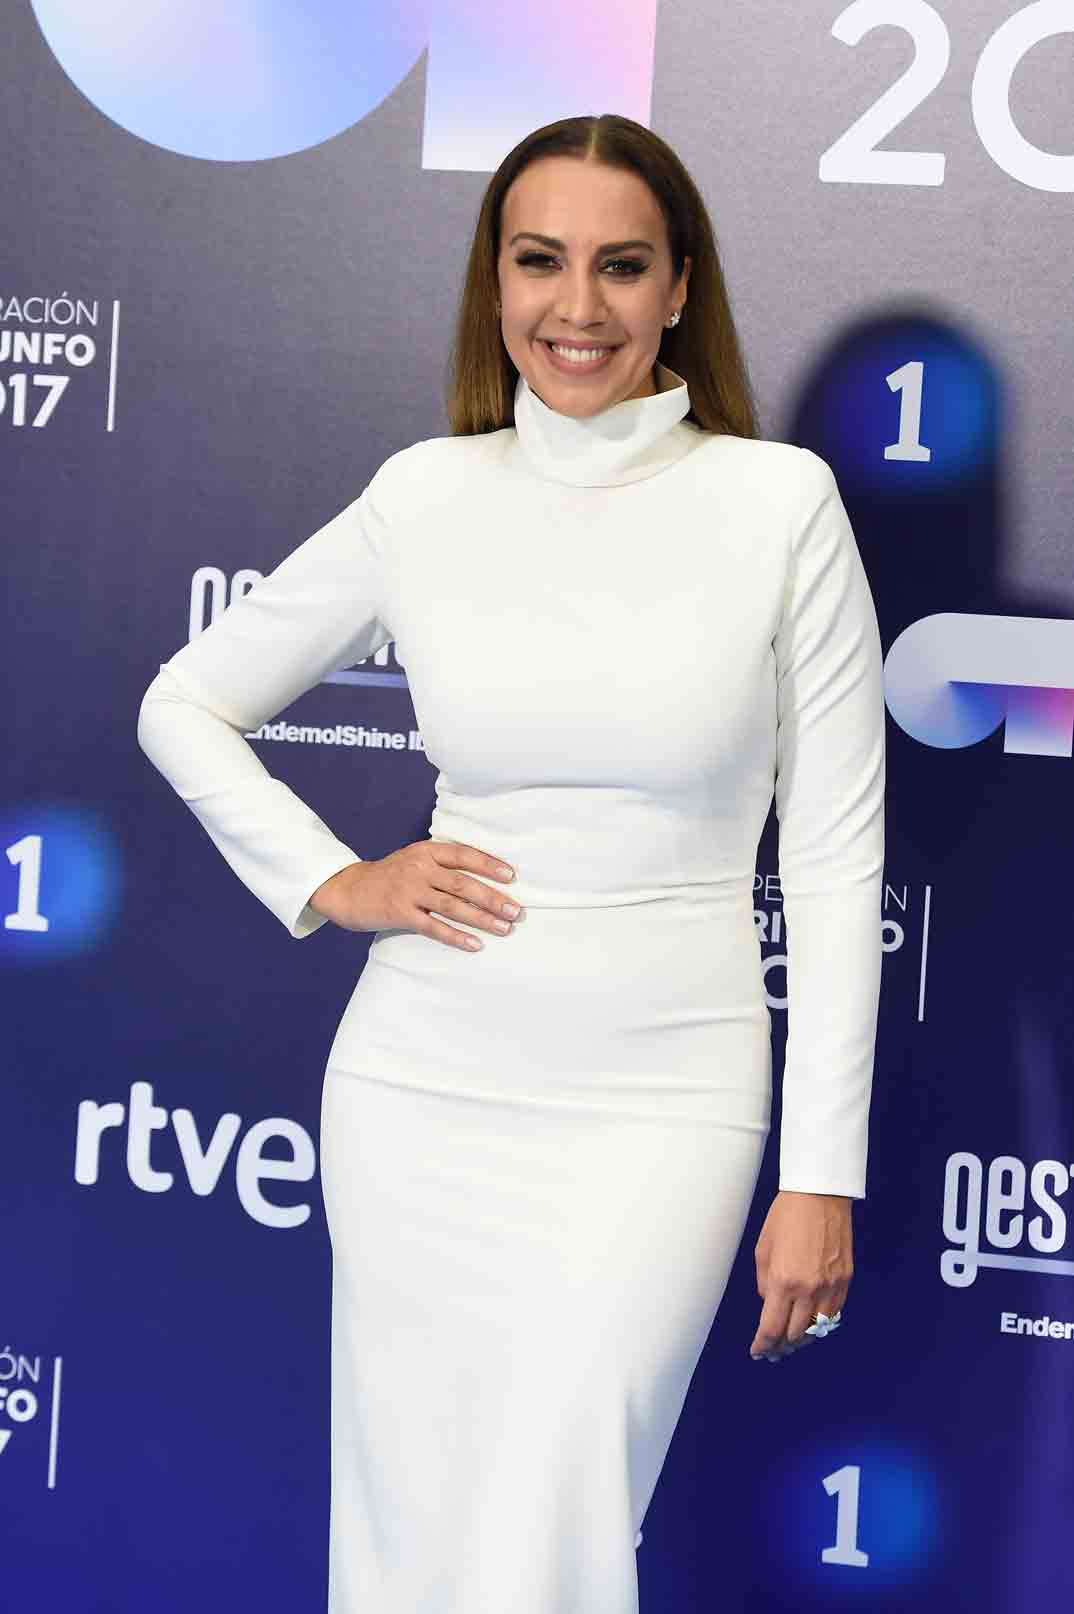 Mónica Naranjo presentará Mónica y el sexo